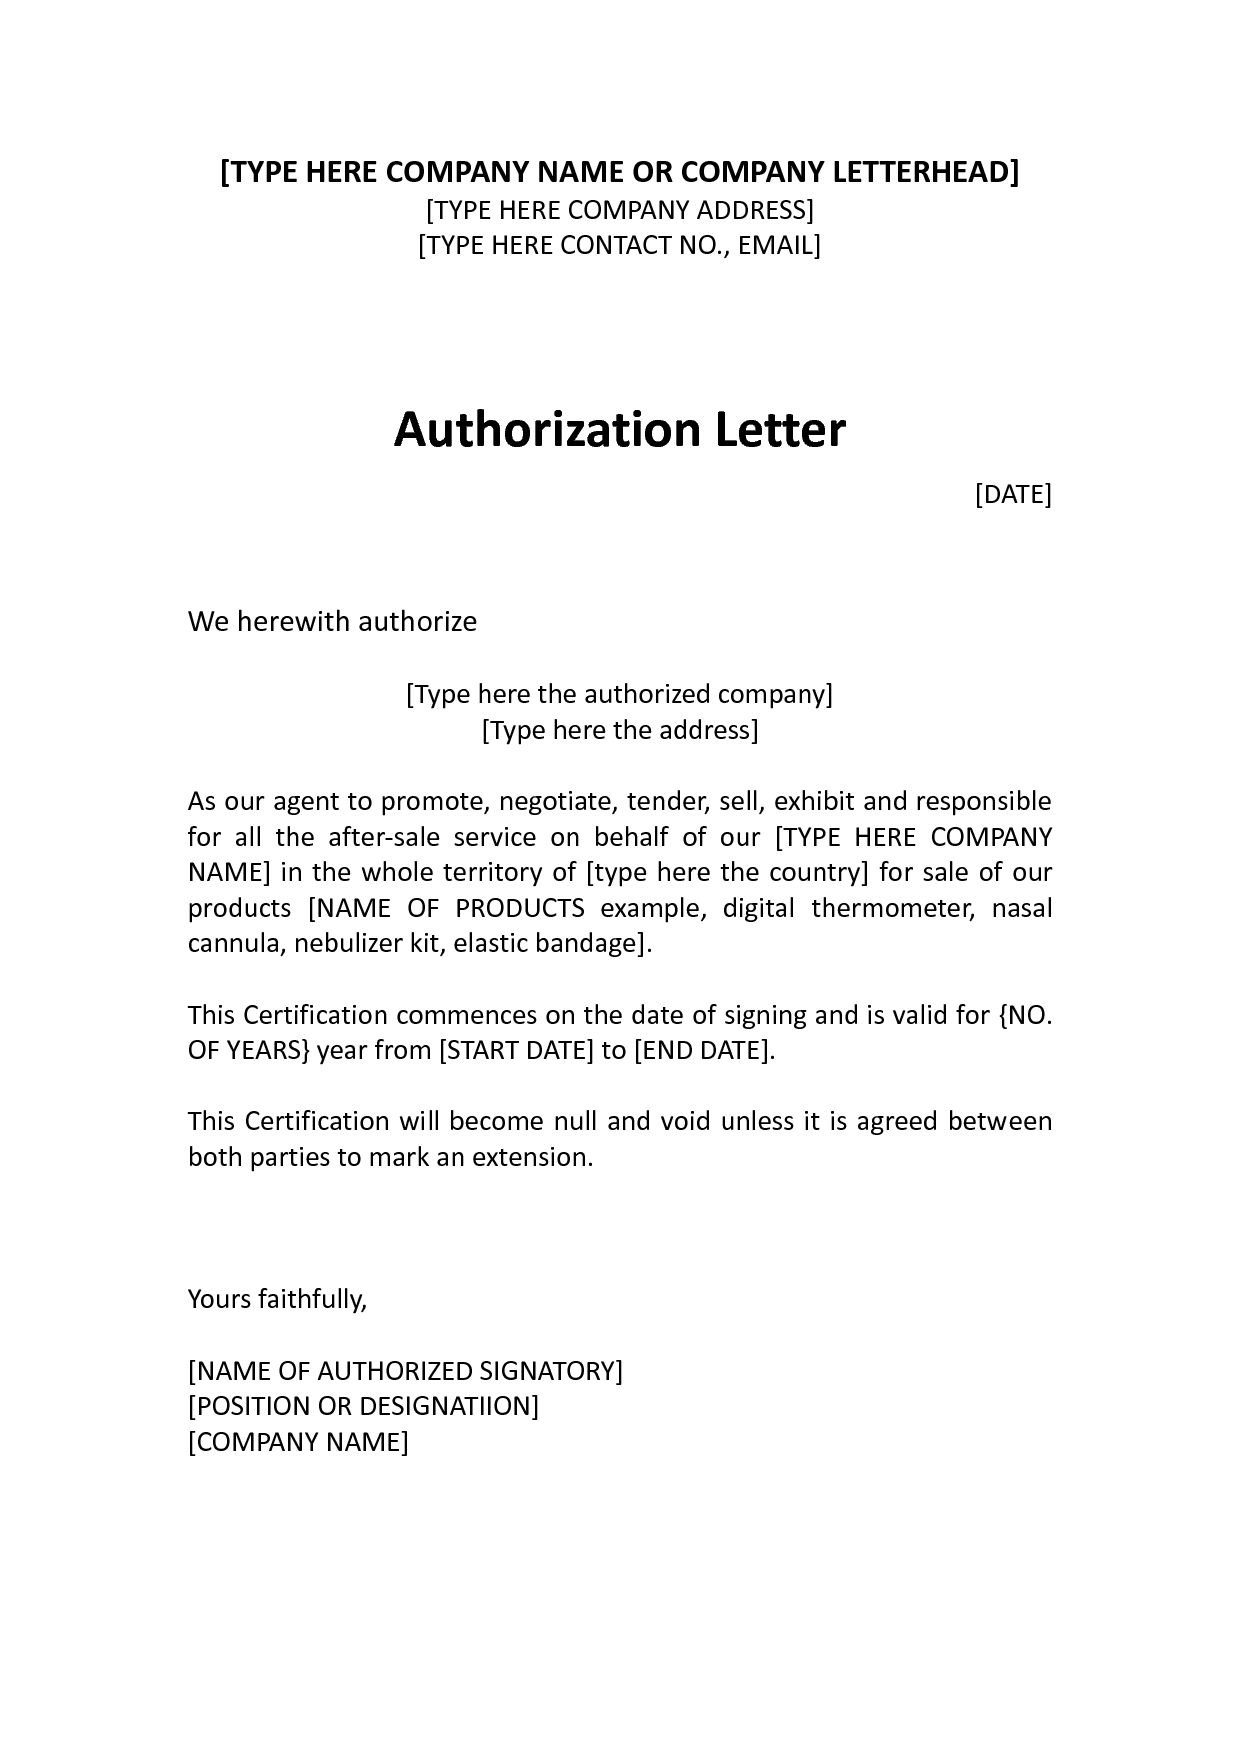 Amazon Appeal Letter Template - Authorization Distributor Letter Sample Distributor Dealer